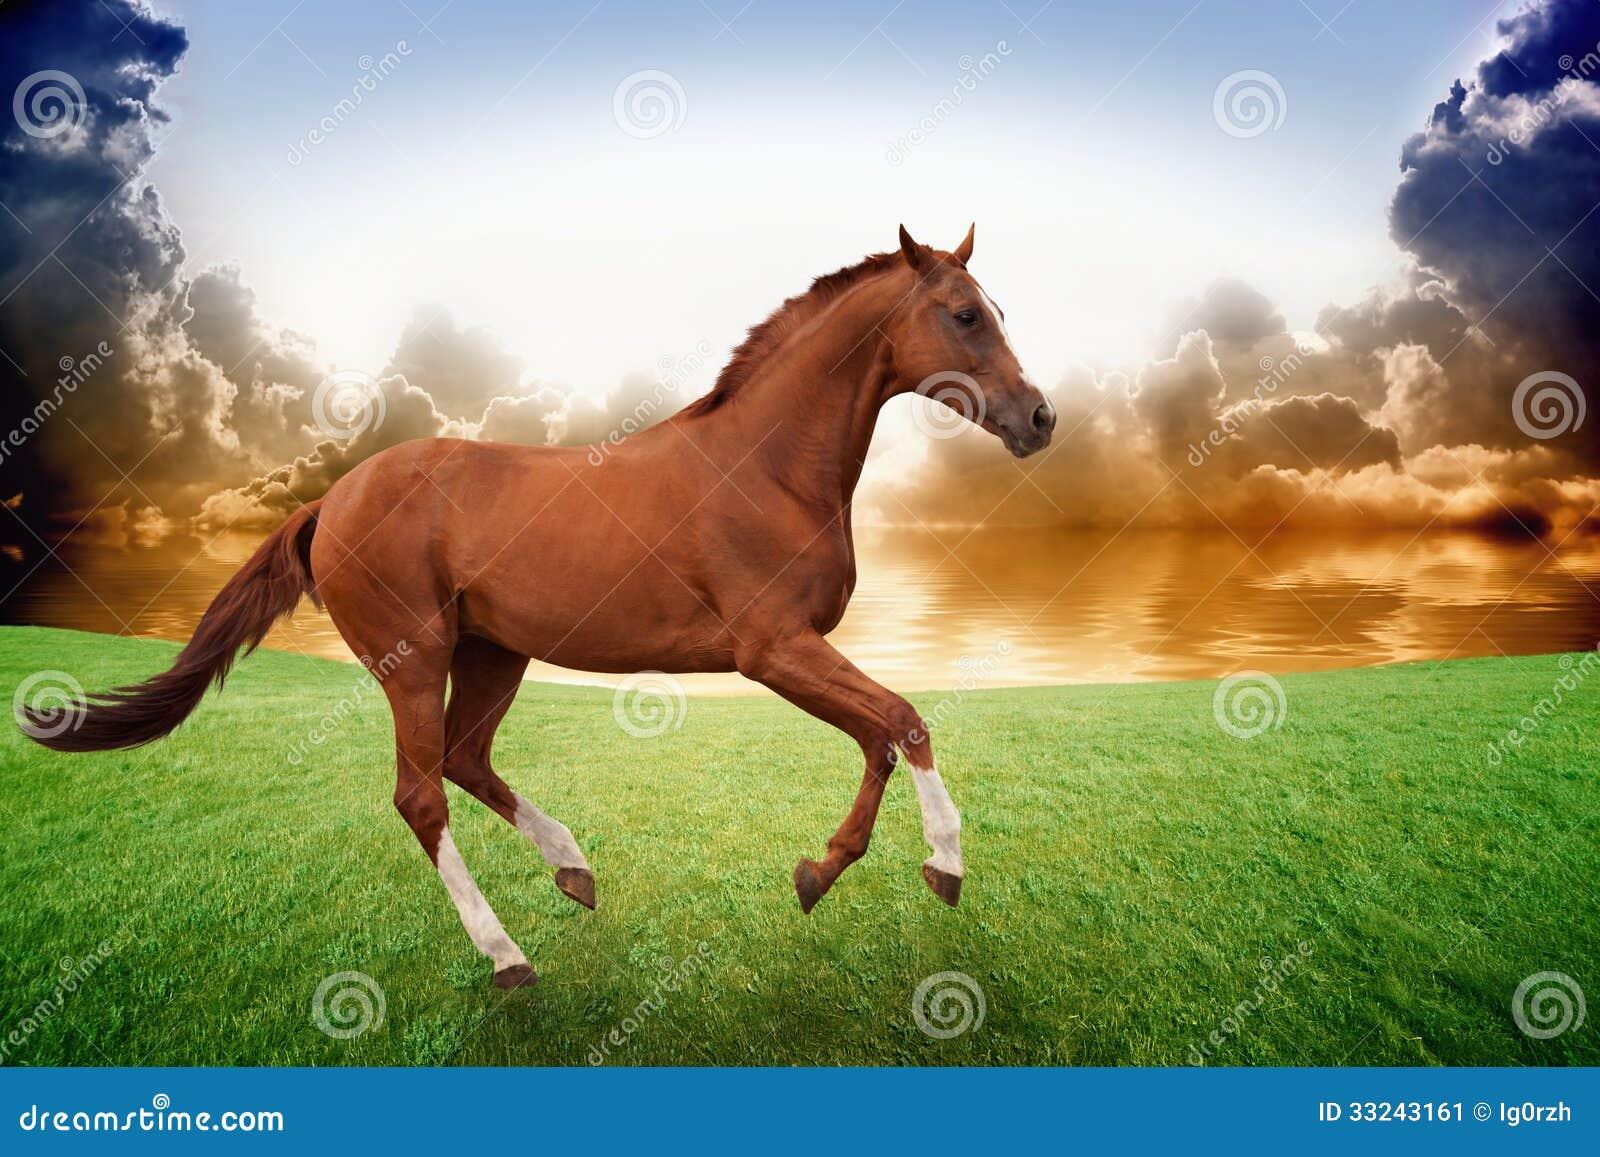 Running Horse Sunset Stock Image Image Of Cloud Grass 33243161